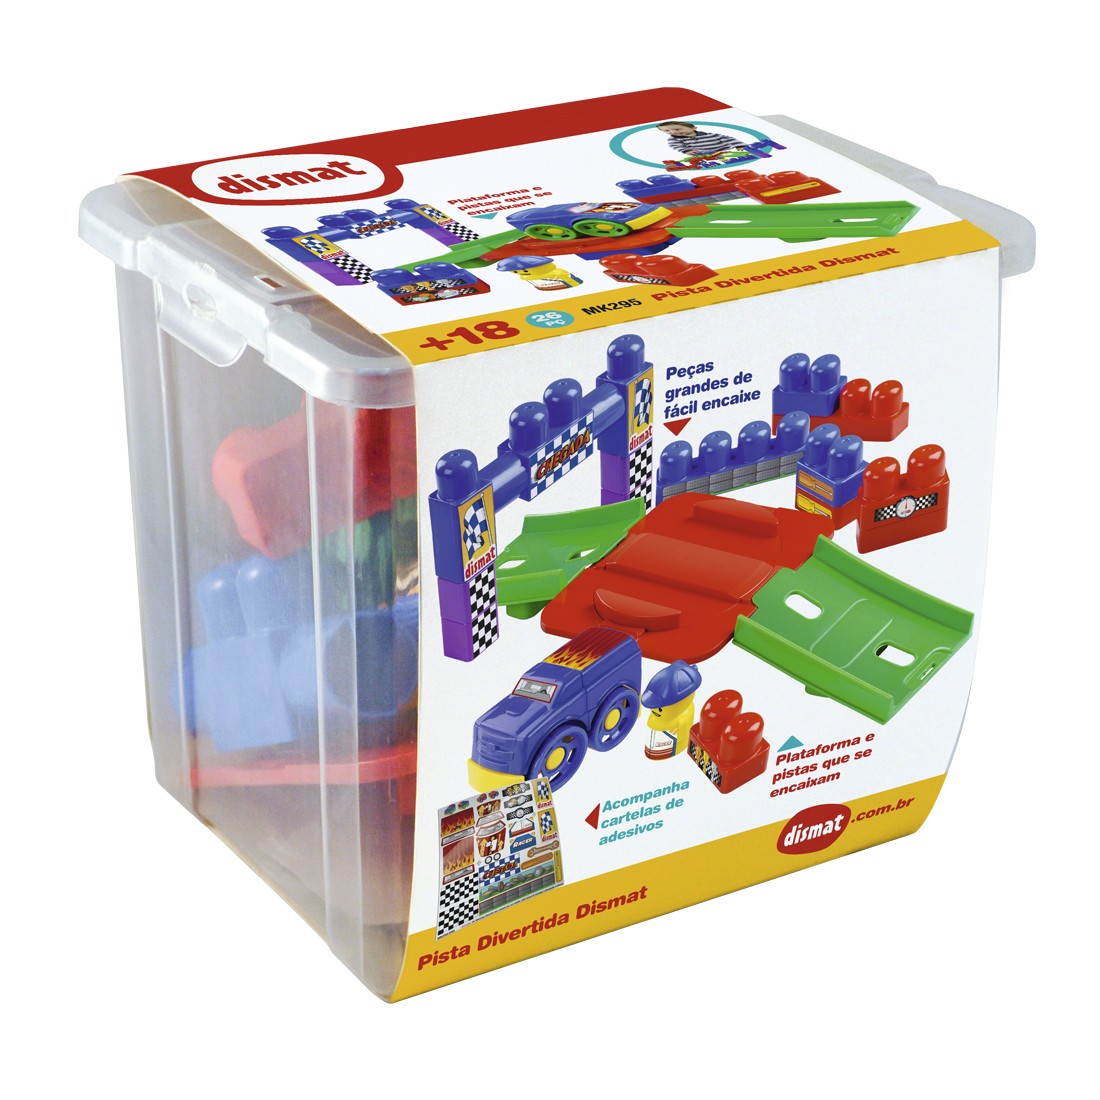 Brinquedo Educativo Super Pista Divertida - Dismat